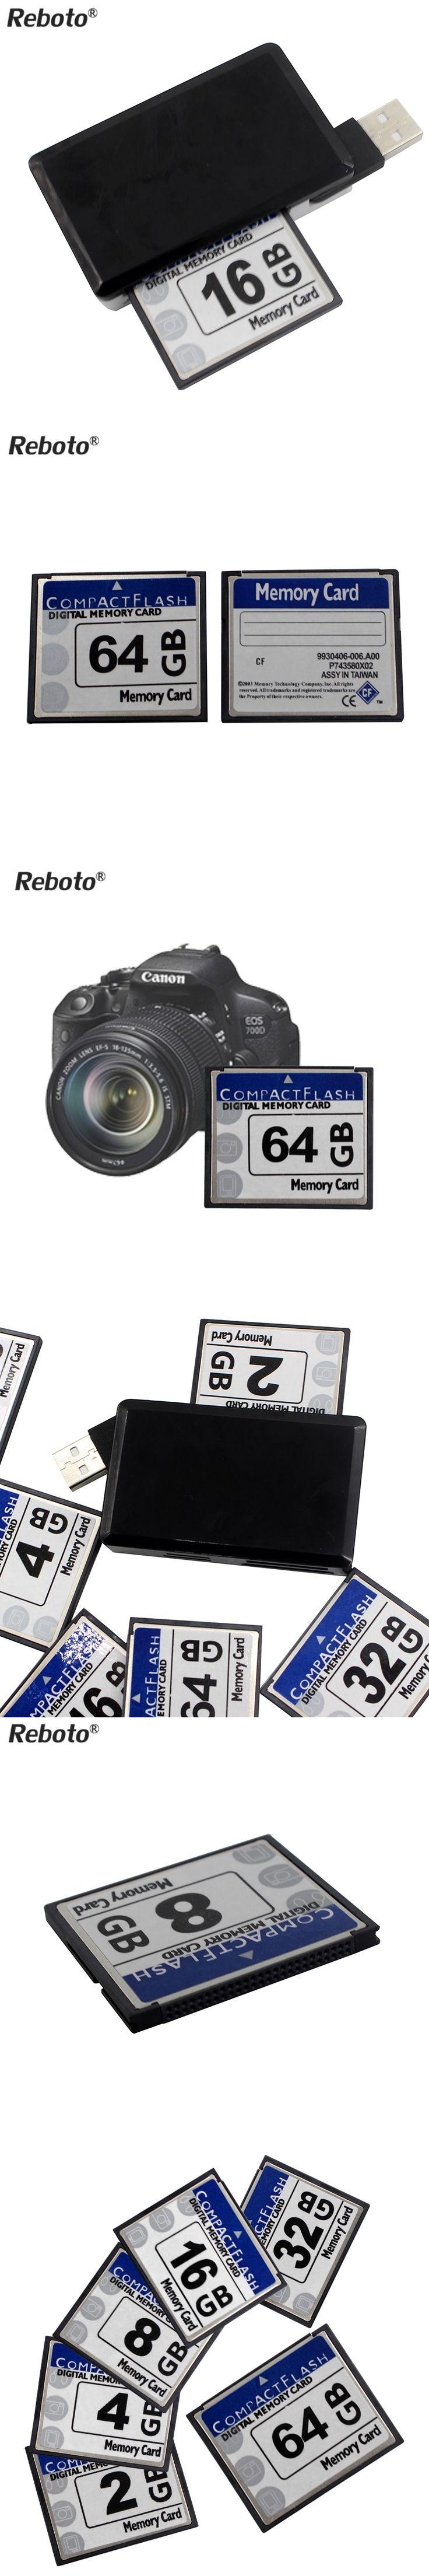 Memory Card CF Cards 4GB 32GB Compact Flash Card 133X High speed Camera Memory Cards 2GB 8GB 16GB 64GB Hot selling